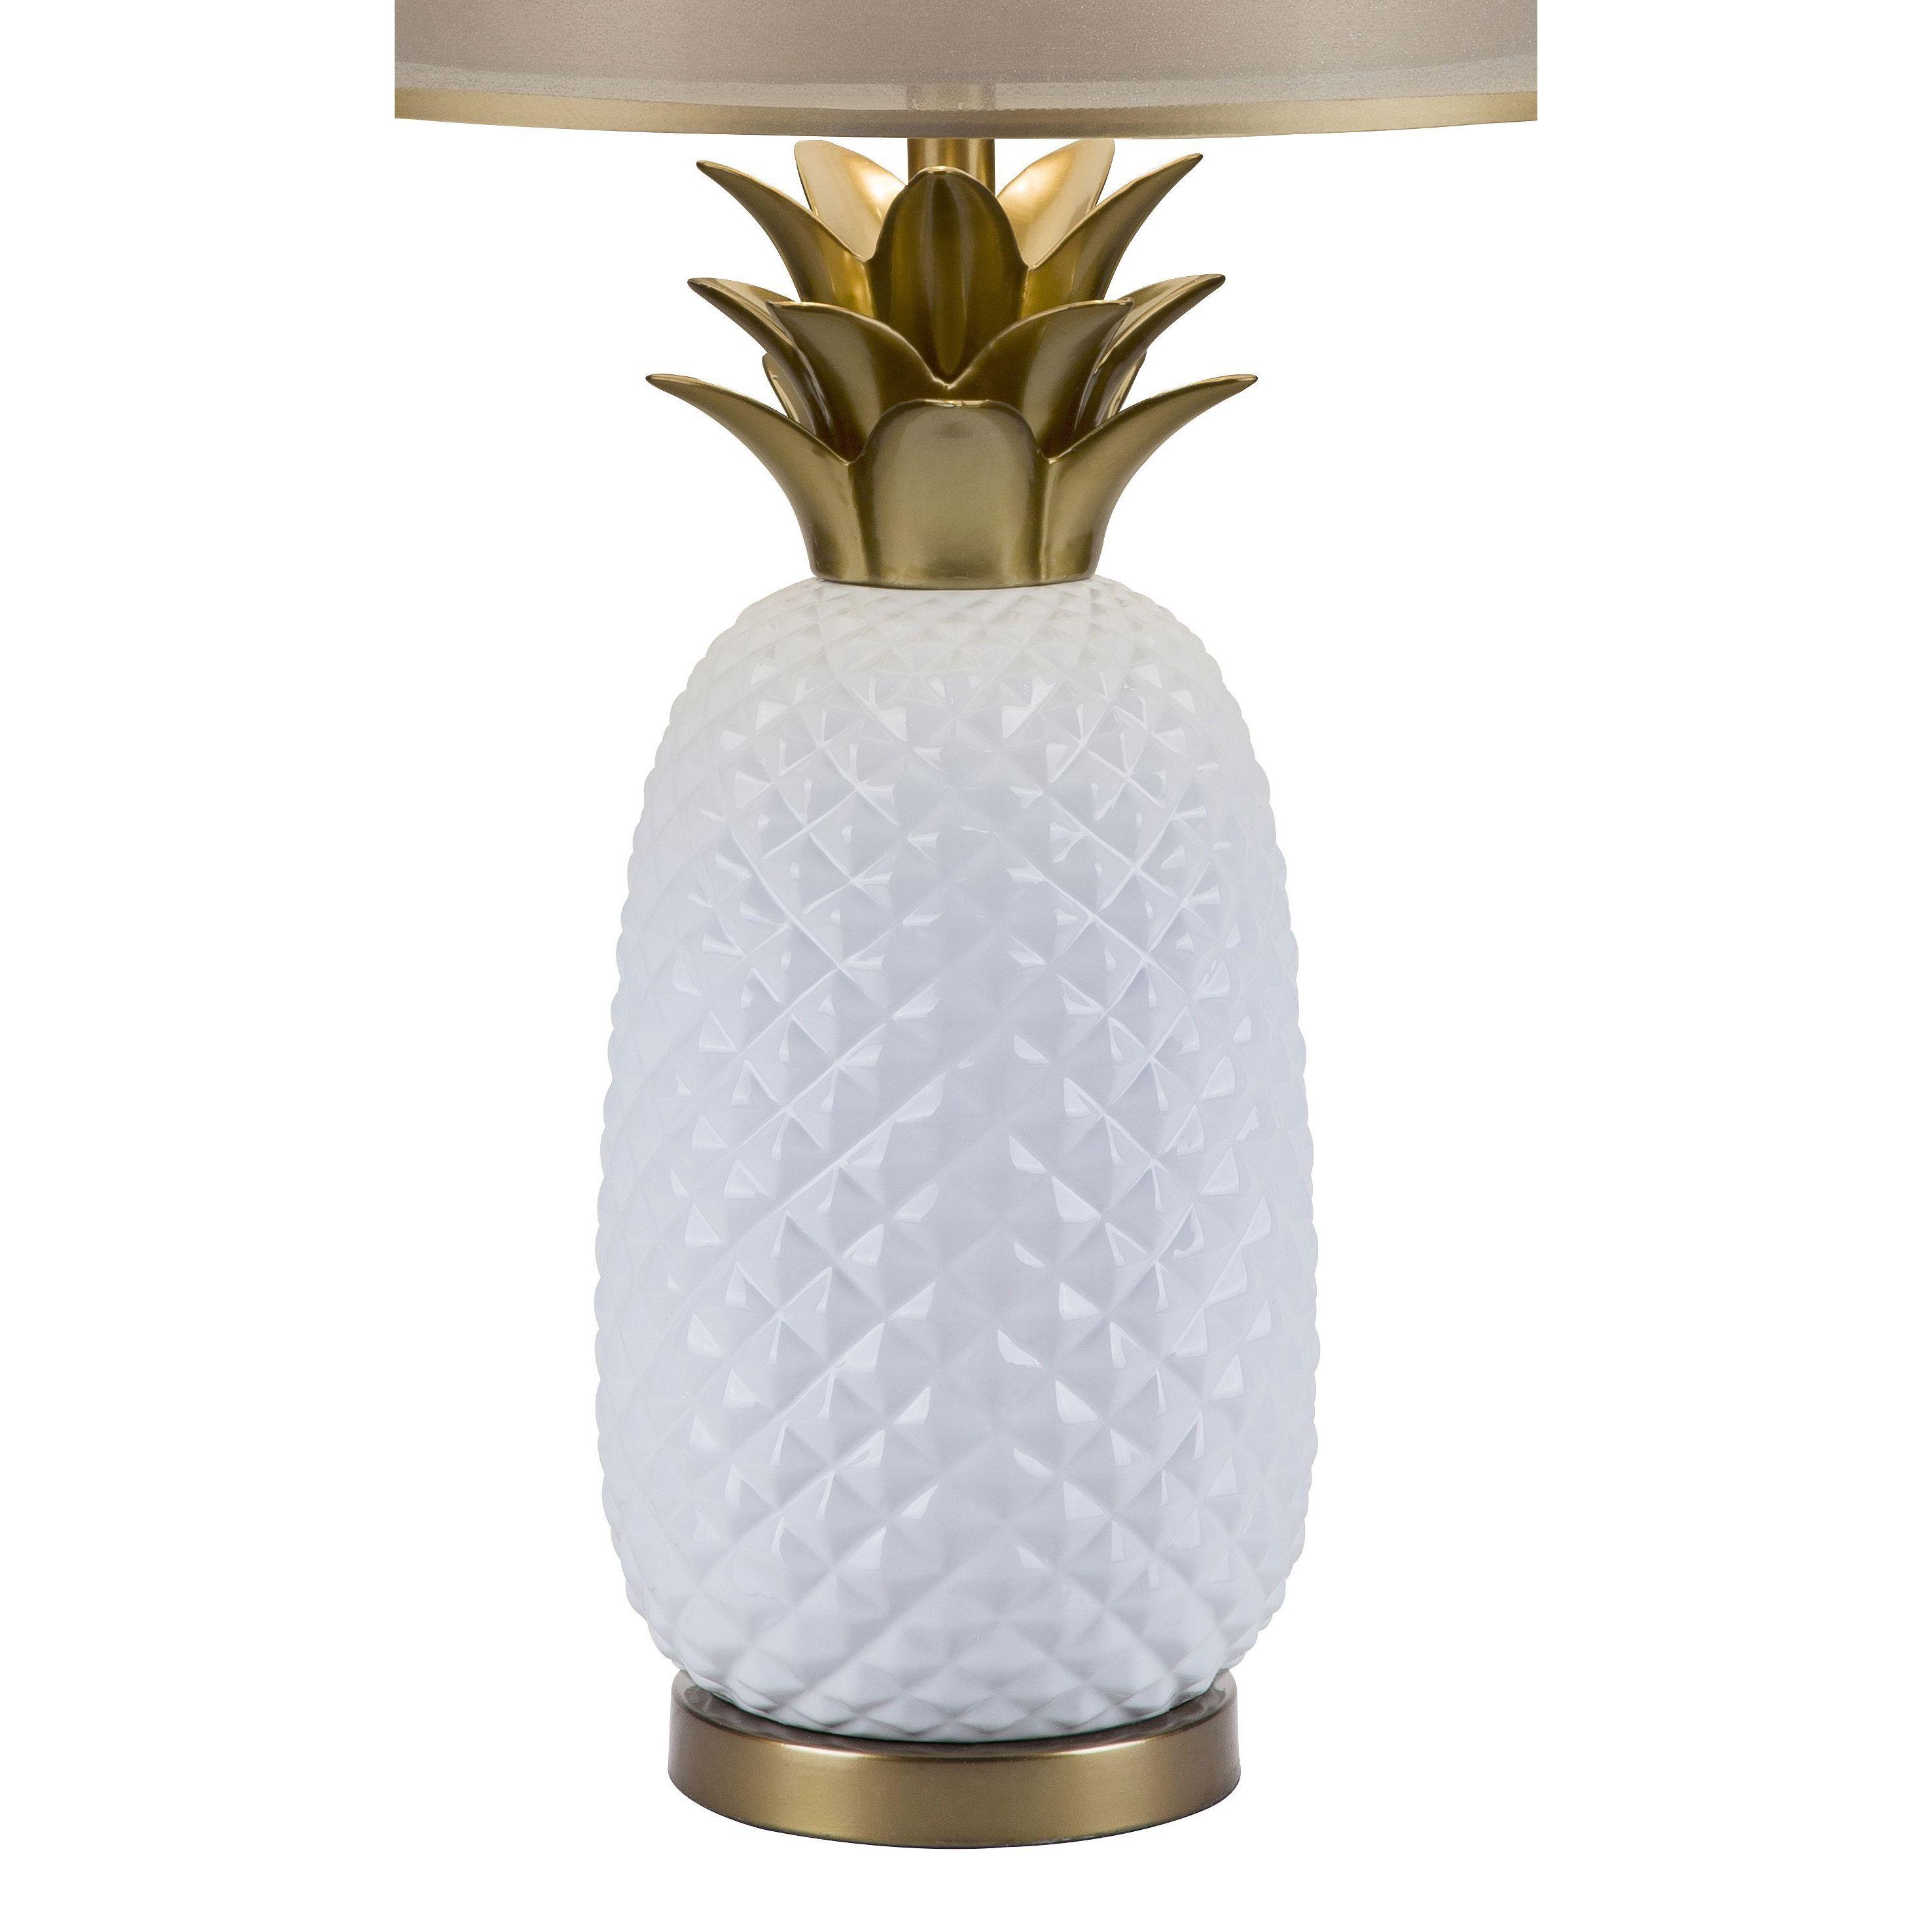 table and mosaic lamp inch glass circulator base speed walmart decobreeze oscillating com fan ip style tiffany pineapple shaped